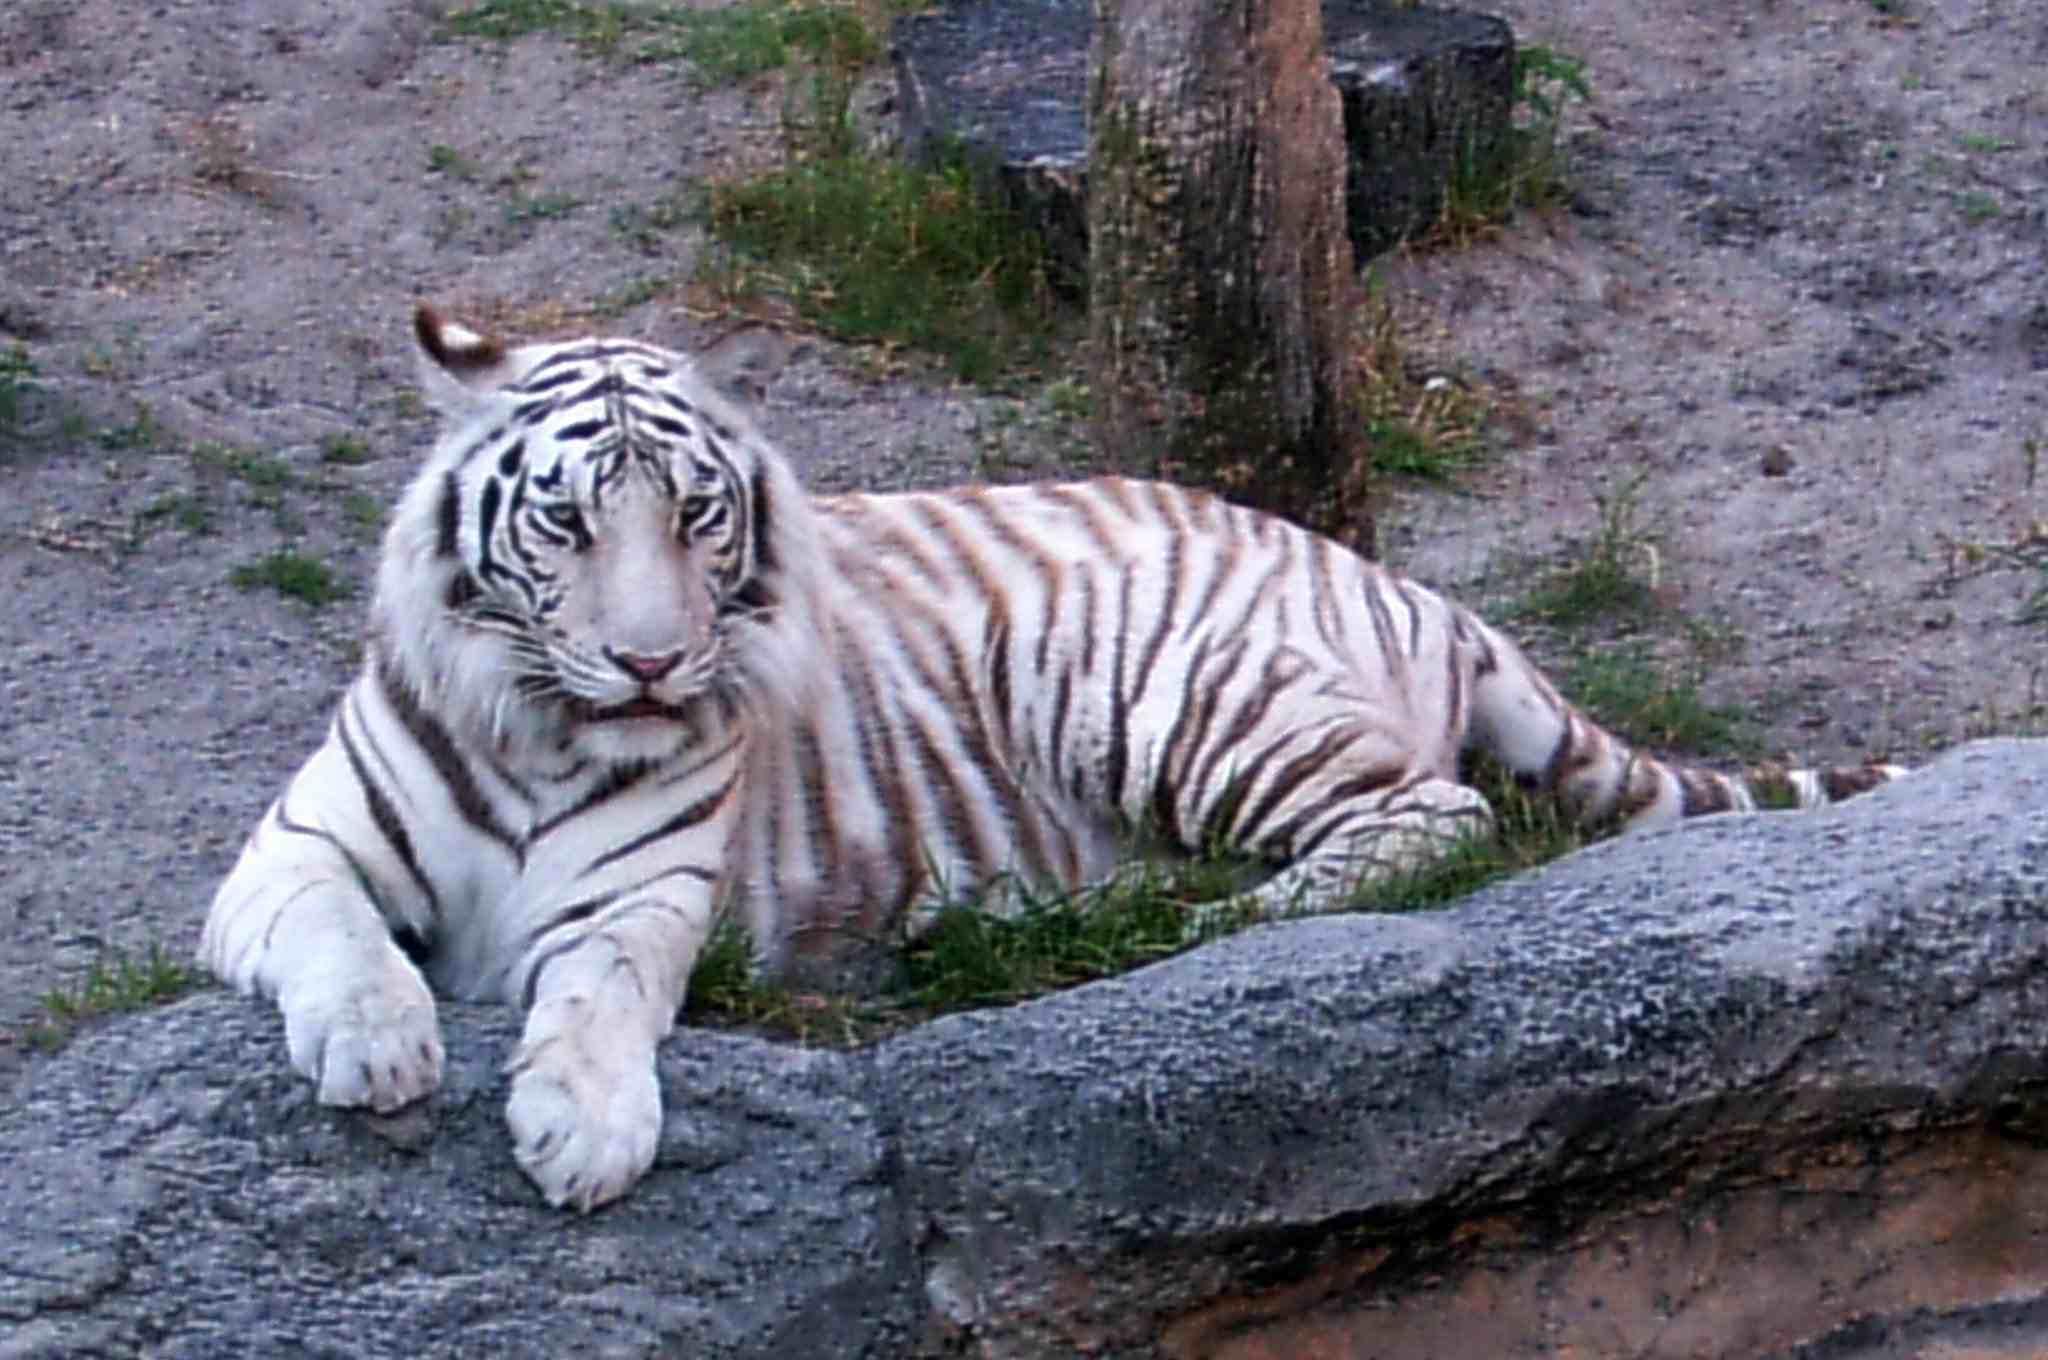 White Siberian Tiger Busch Gardens, Tampa Bay